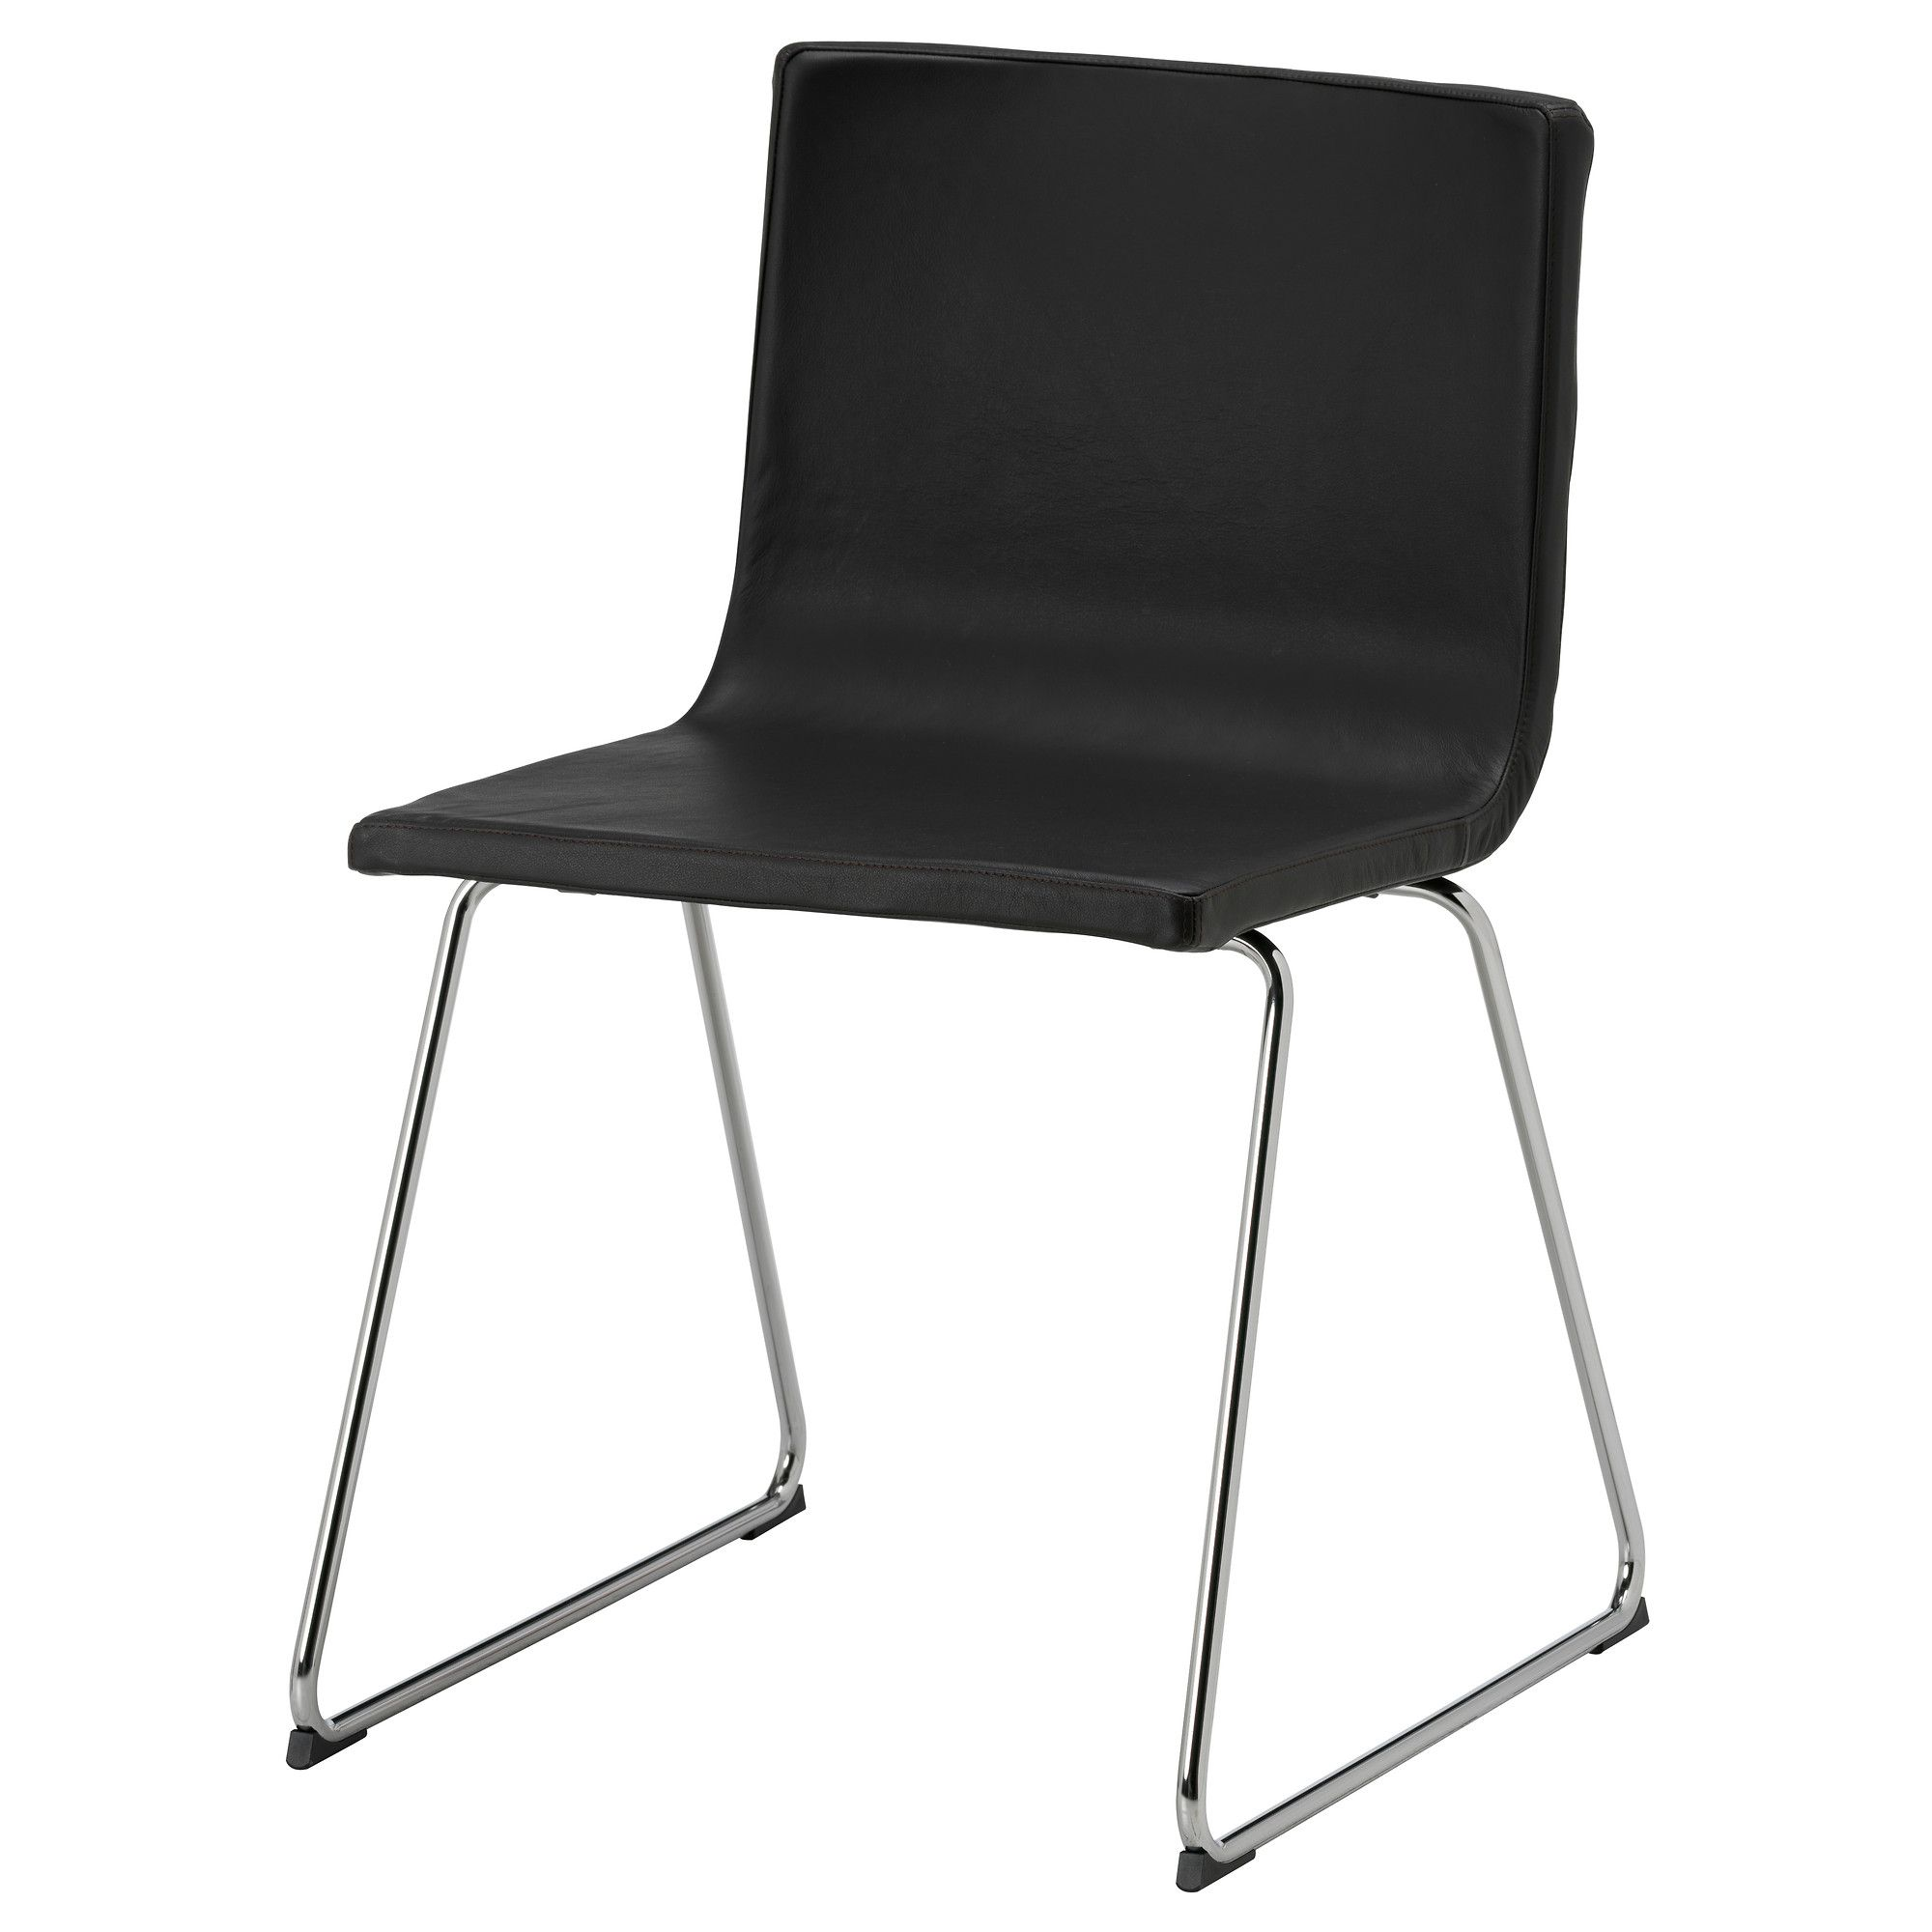 bernhard chair review mission style rocking chrome plated kavat mjuk dark brown ugh